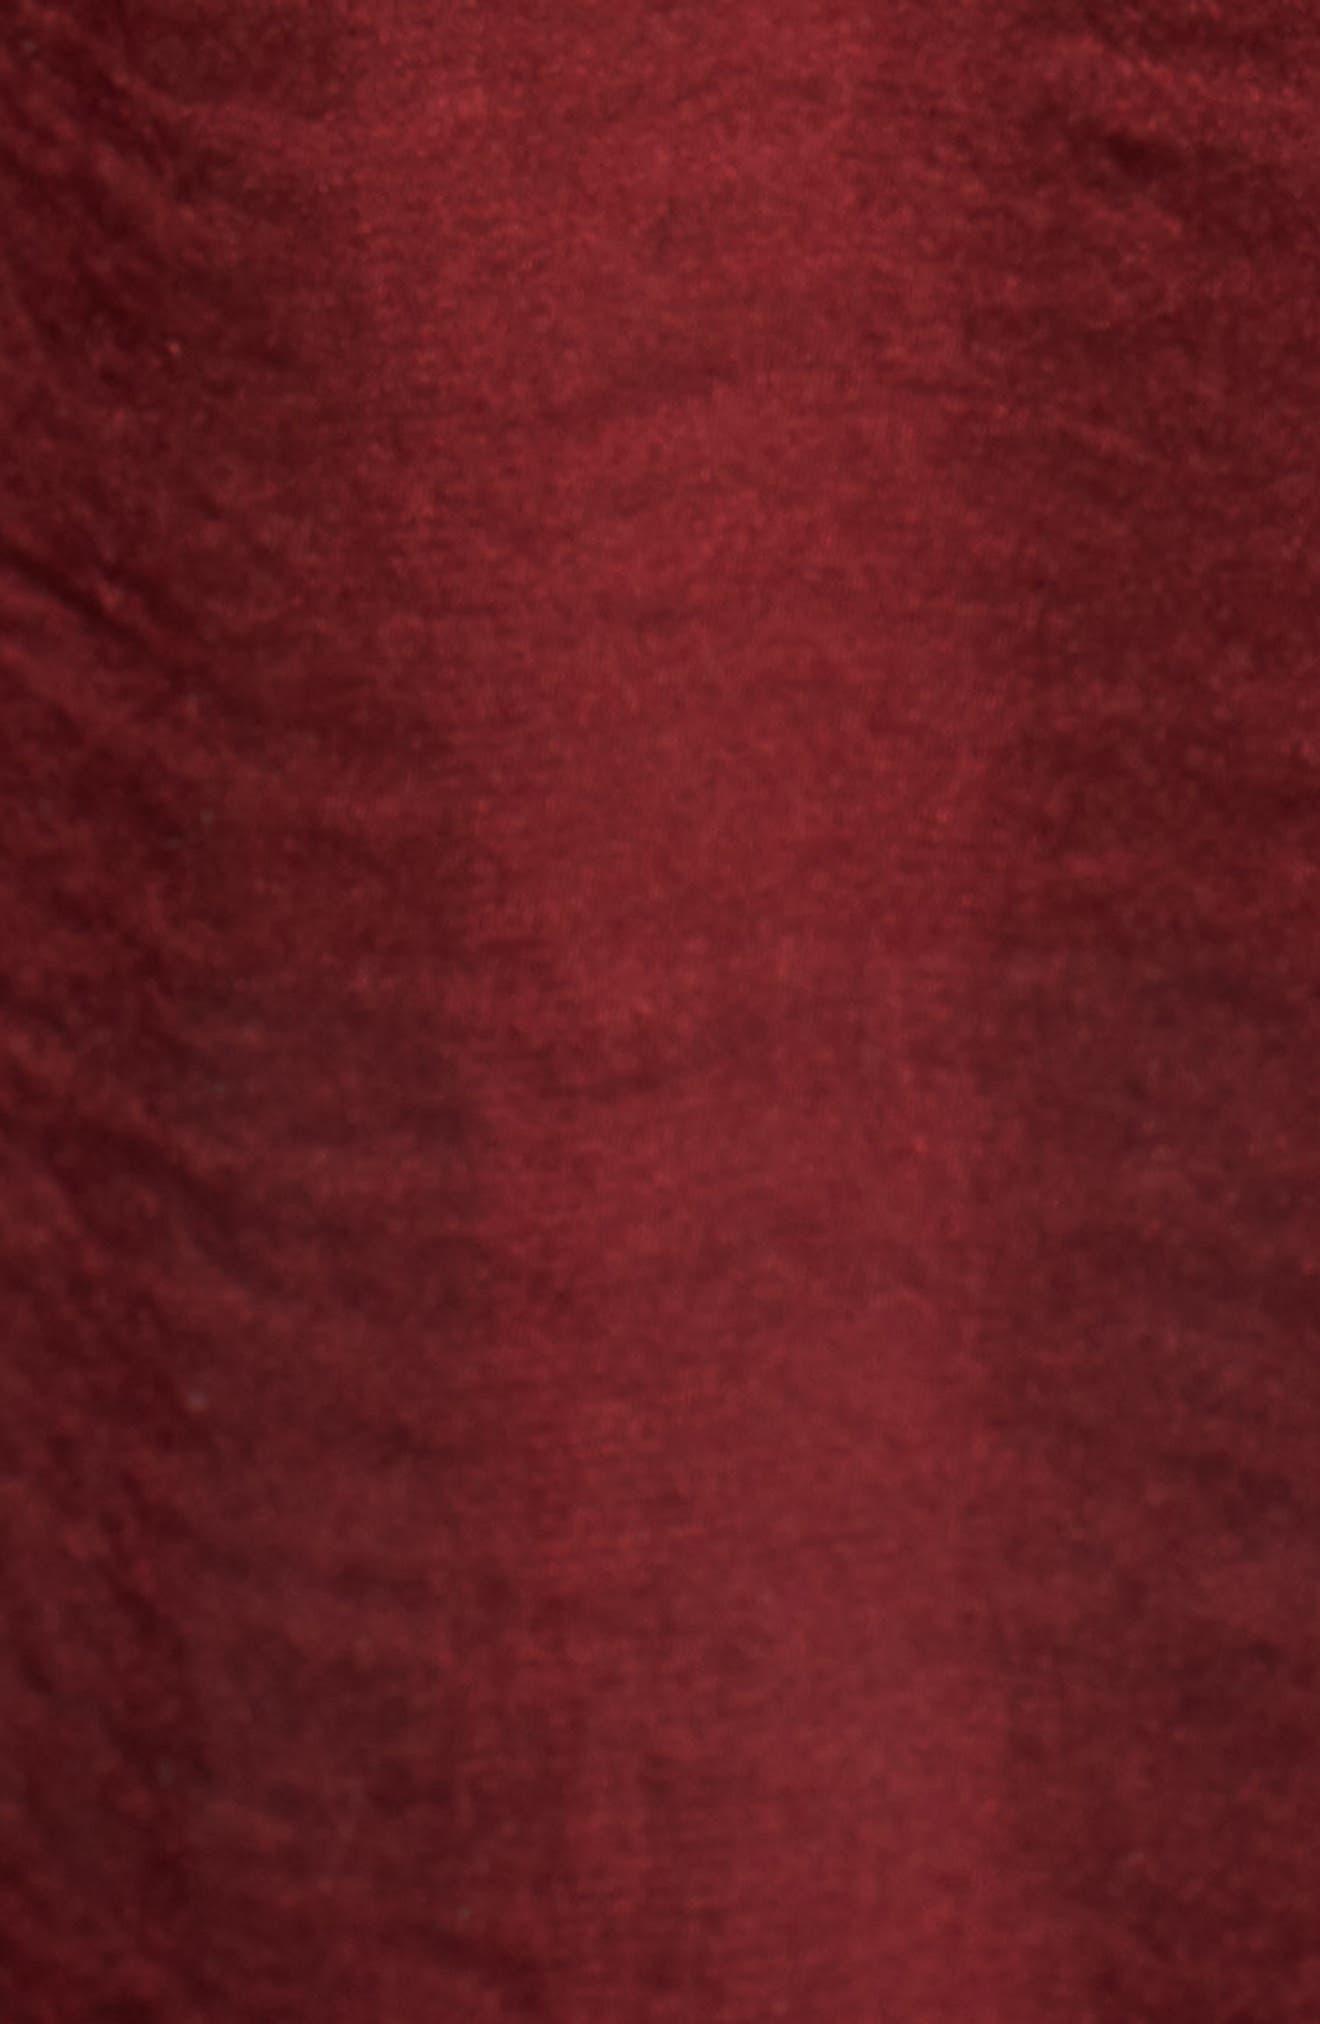 Mirah Off the Shoulder Satin Top,                             Alternate thumbnail 6, color,                             Cranberry